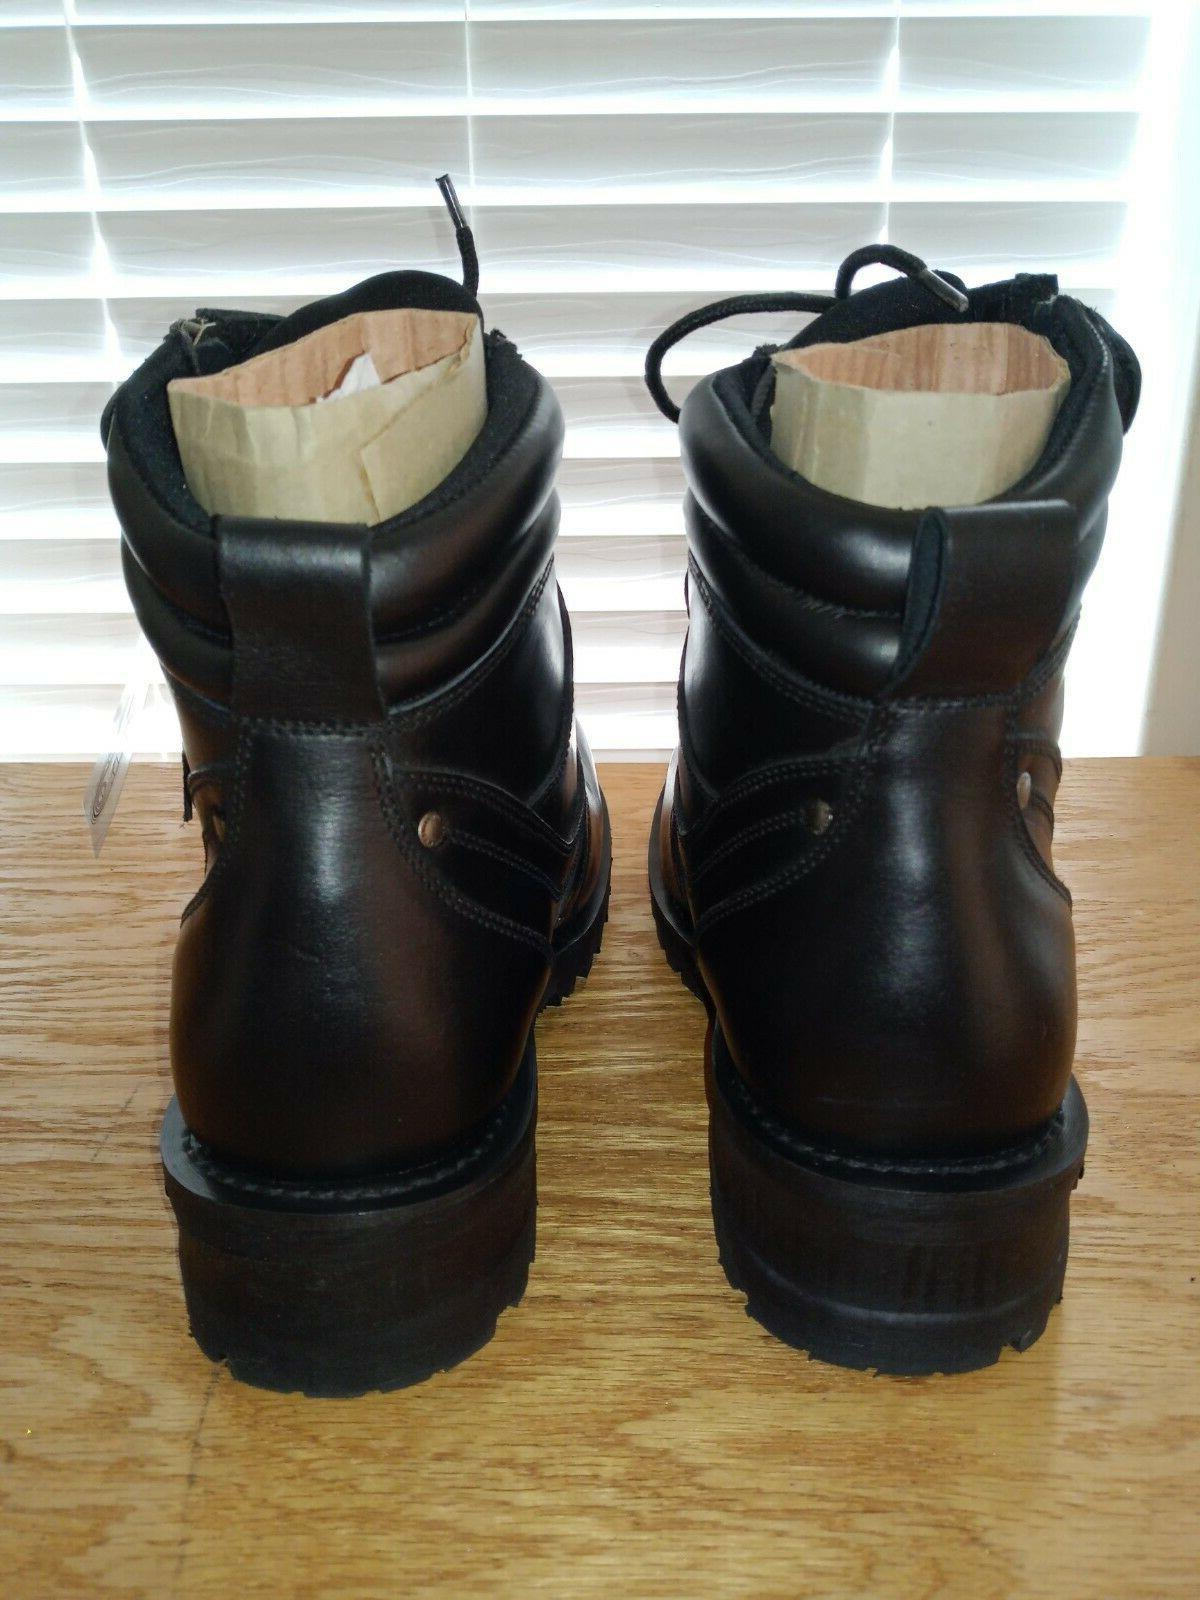 w/ & Plain Toe - Size